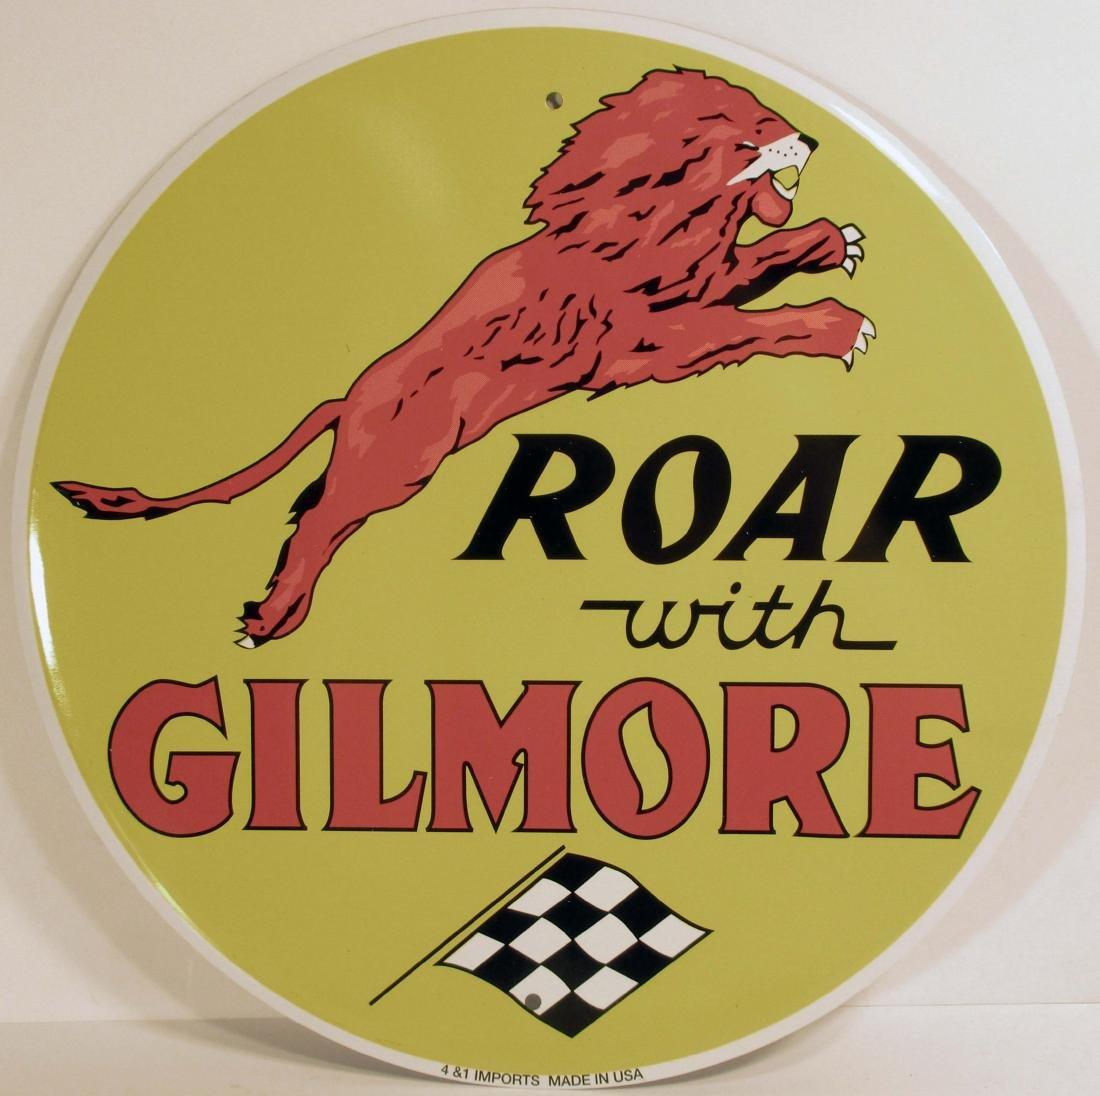 "METAL ROAR W/ GILMORE ROUND ADVERTISING SIGN - 12"" DIAM"